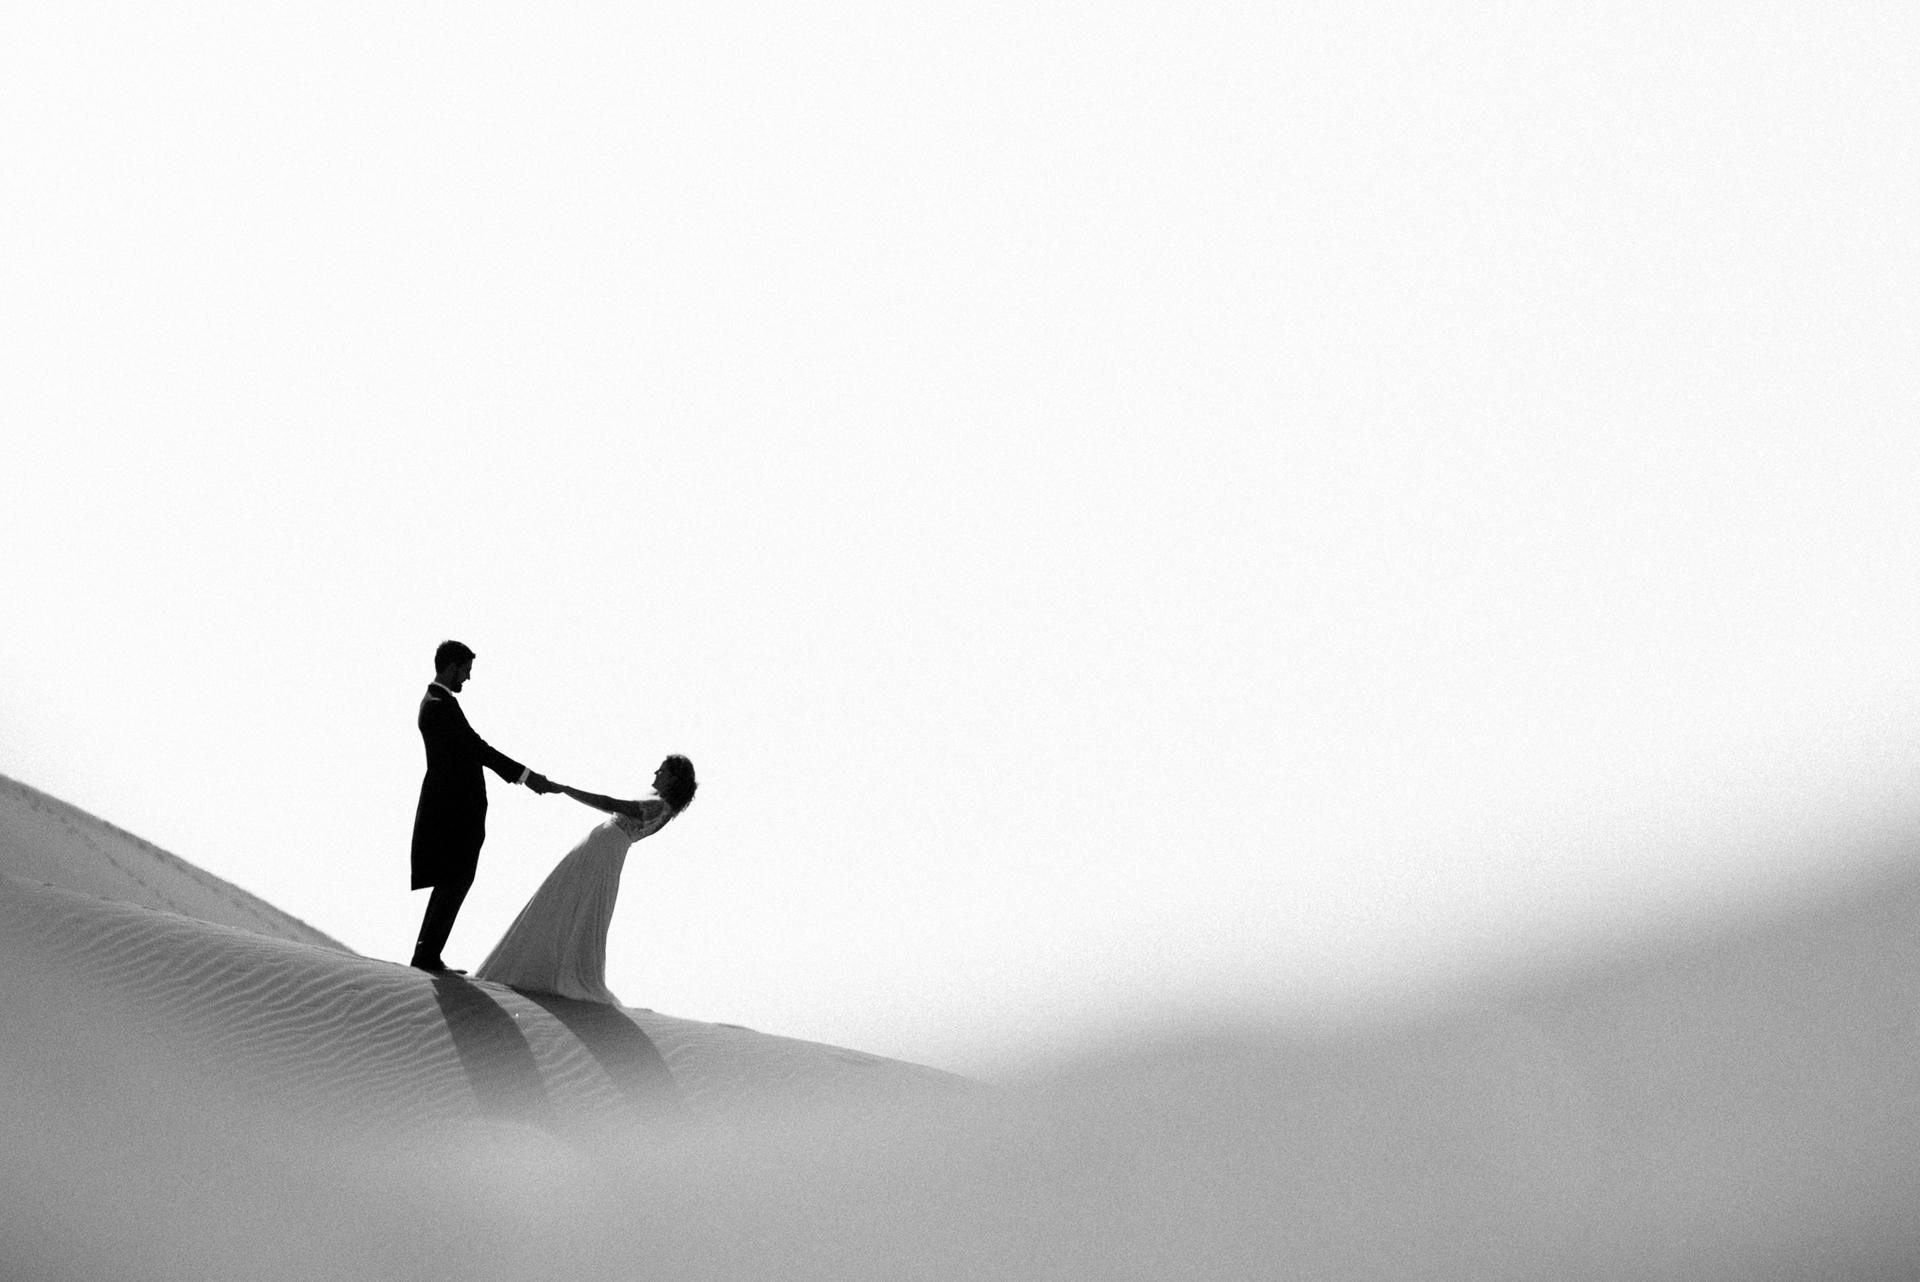 destination wedding photography, boda de destine, wedding canary islands, bodas en gran canaria, wedding, gran canaria, islas canarias